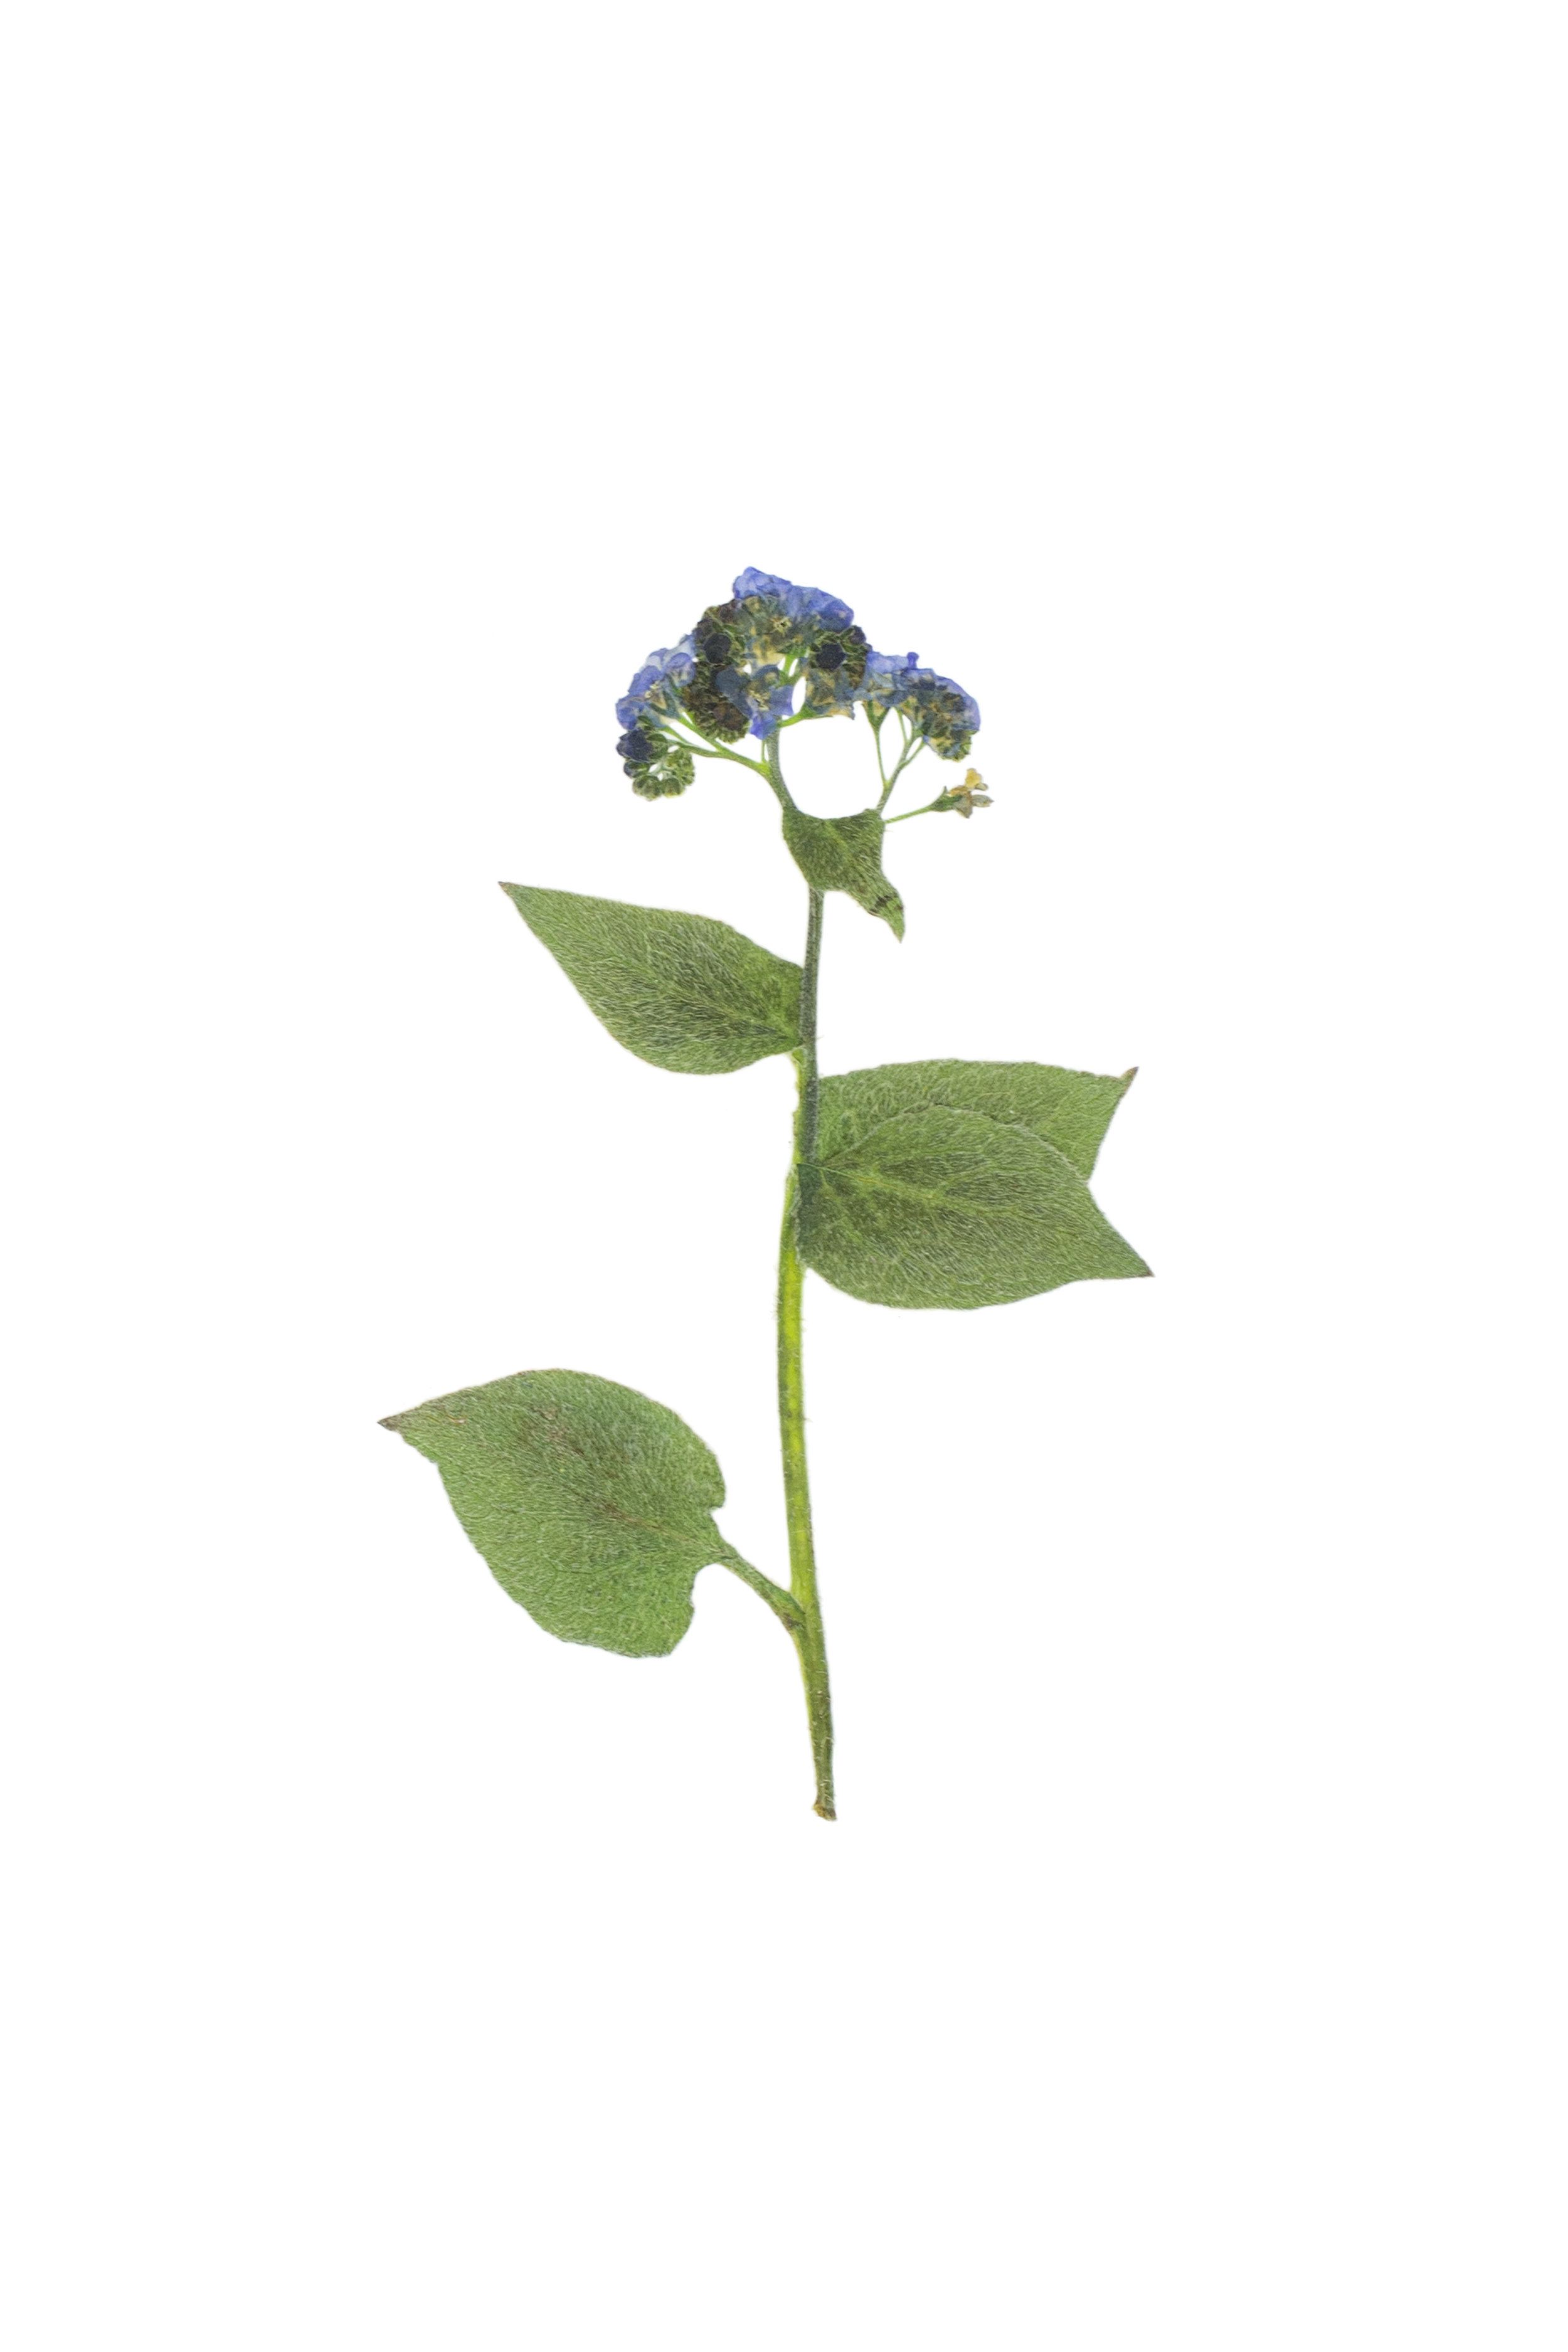 Great Forget-Me-Not / Brunnera macrophylla